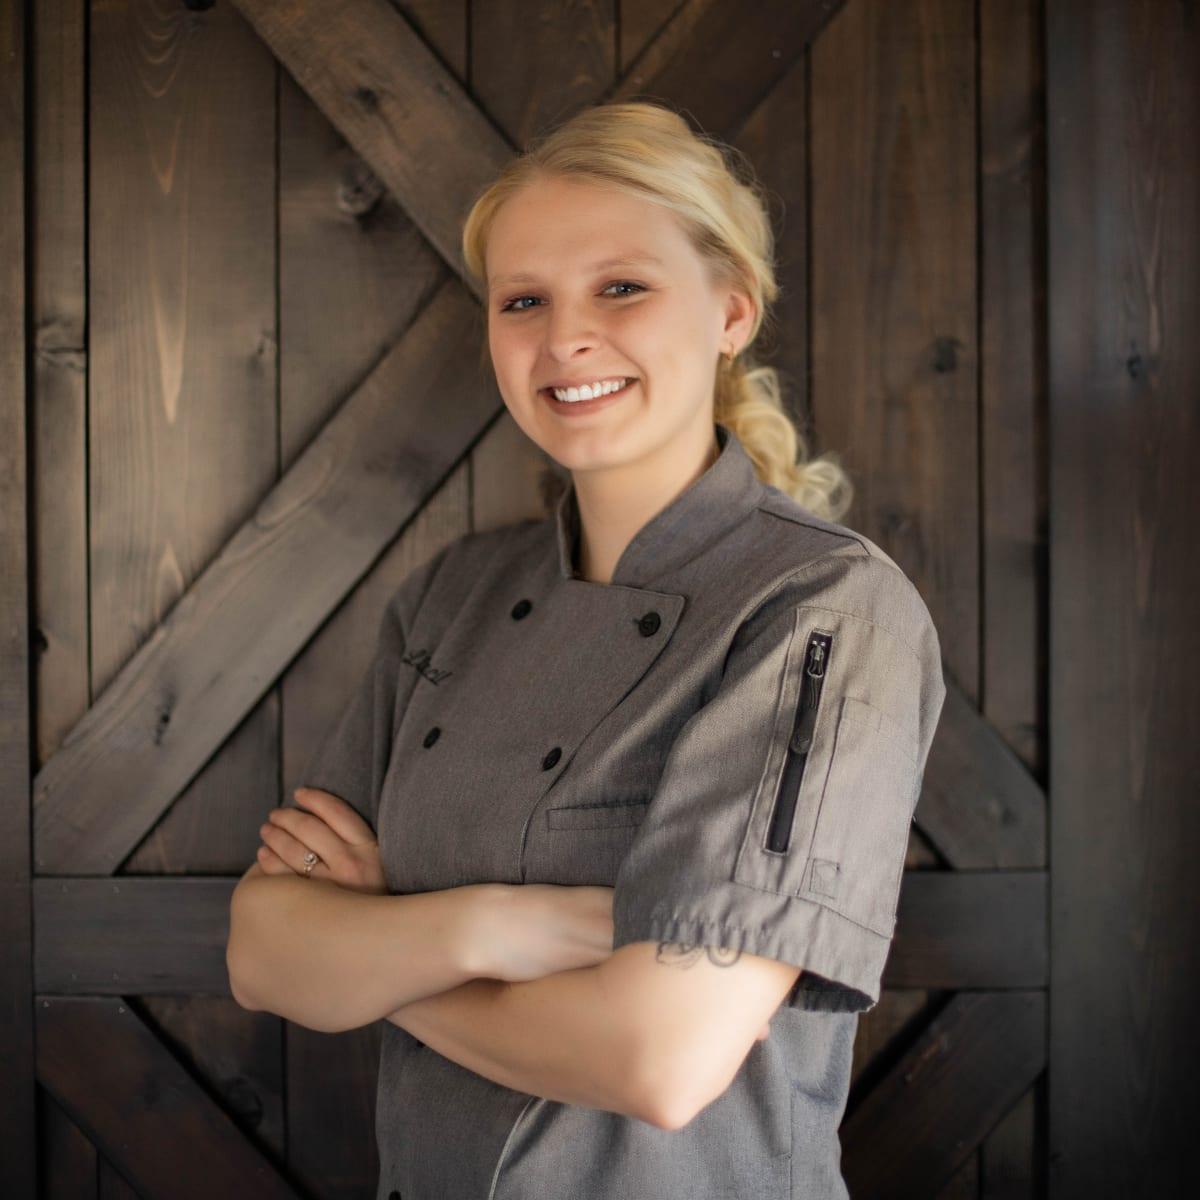 Liliane Stancil, Culinary Director at Keystone Place at Richland Creek in O'Fallon, Illinois